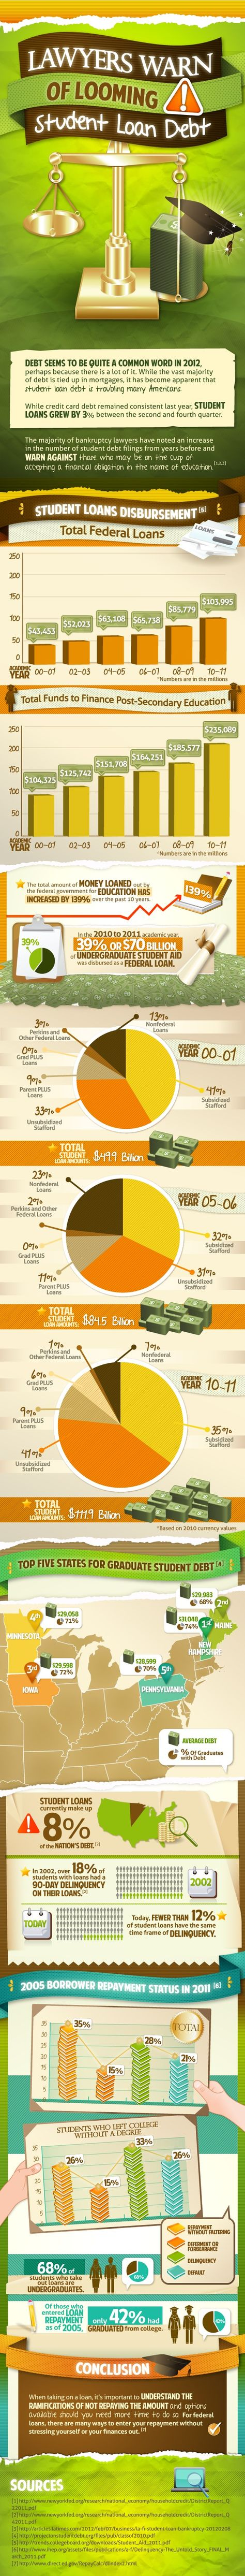 Student Loan Debt Warning #Infographic #education #debt